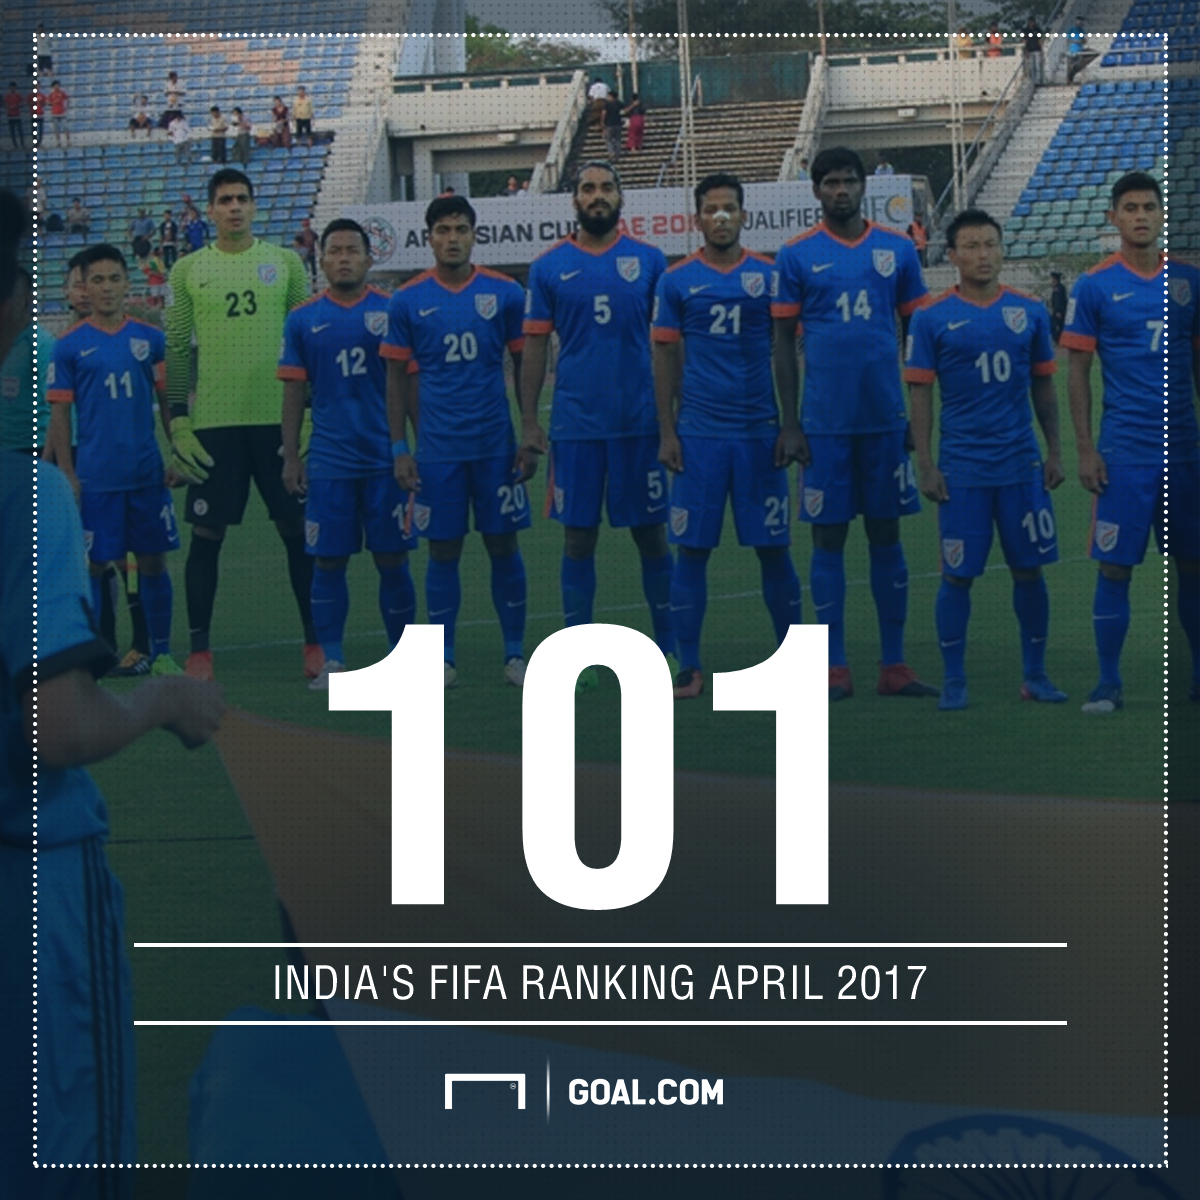 India FIFA Rankings April 2017